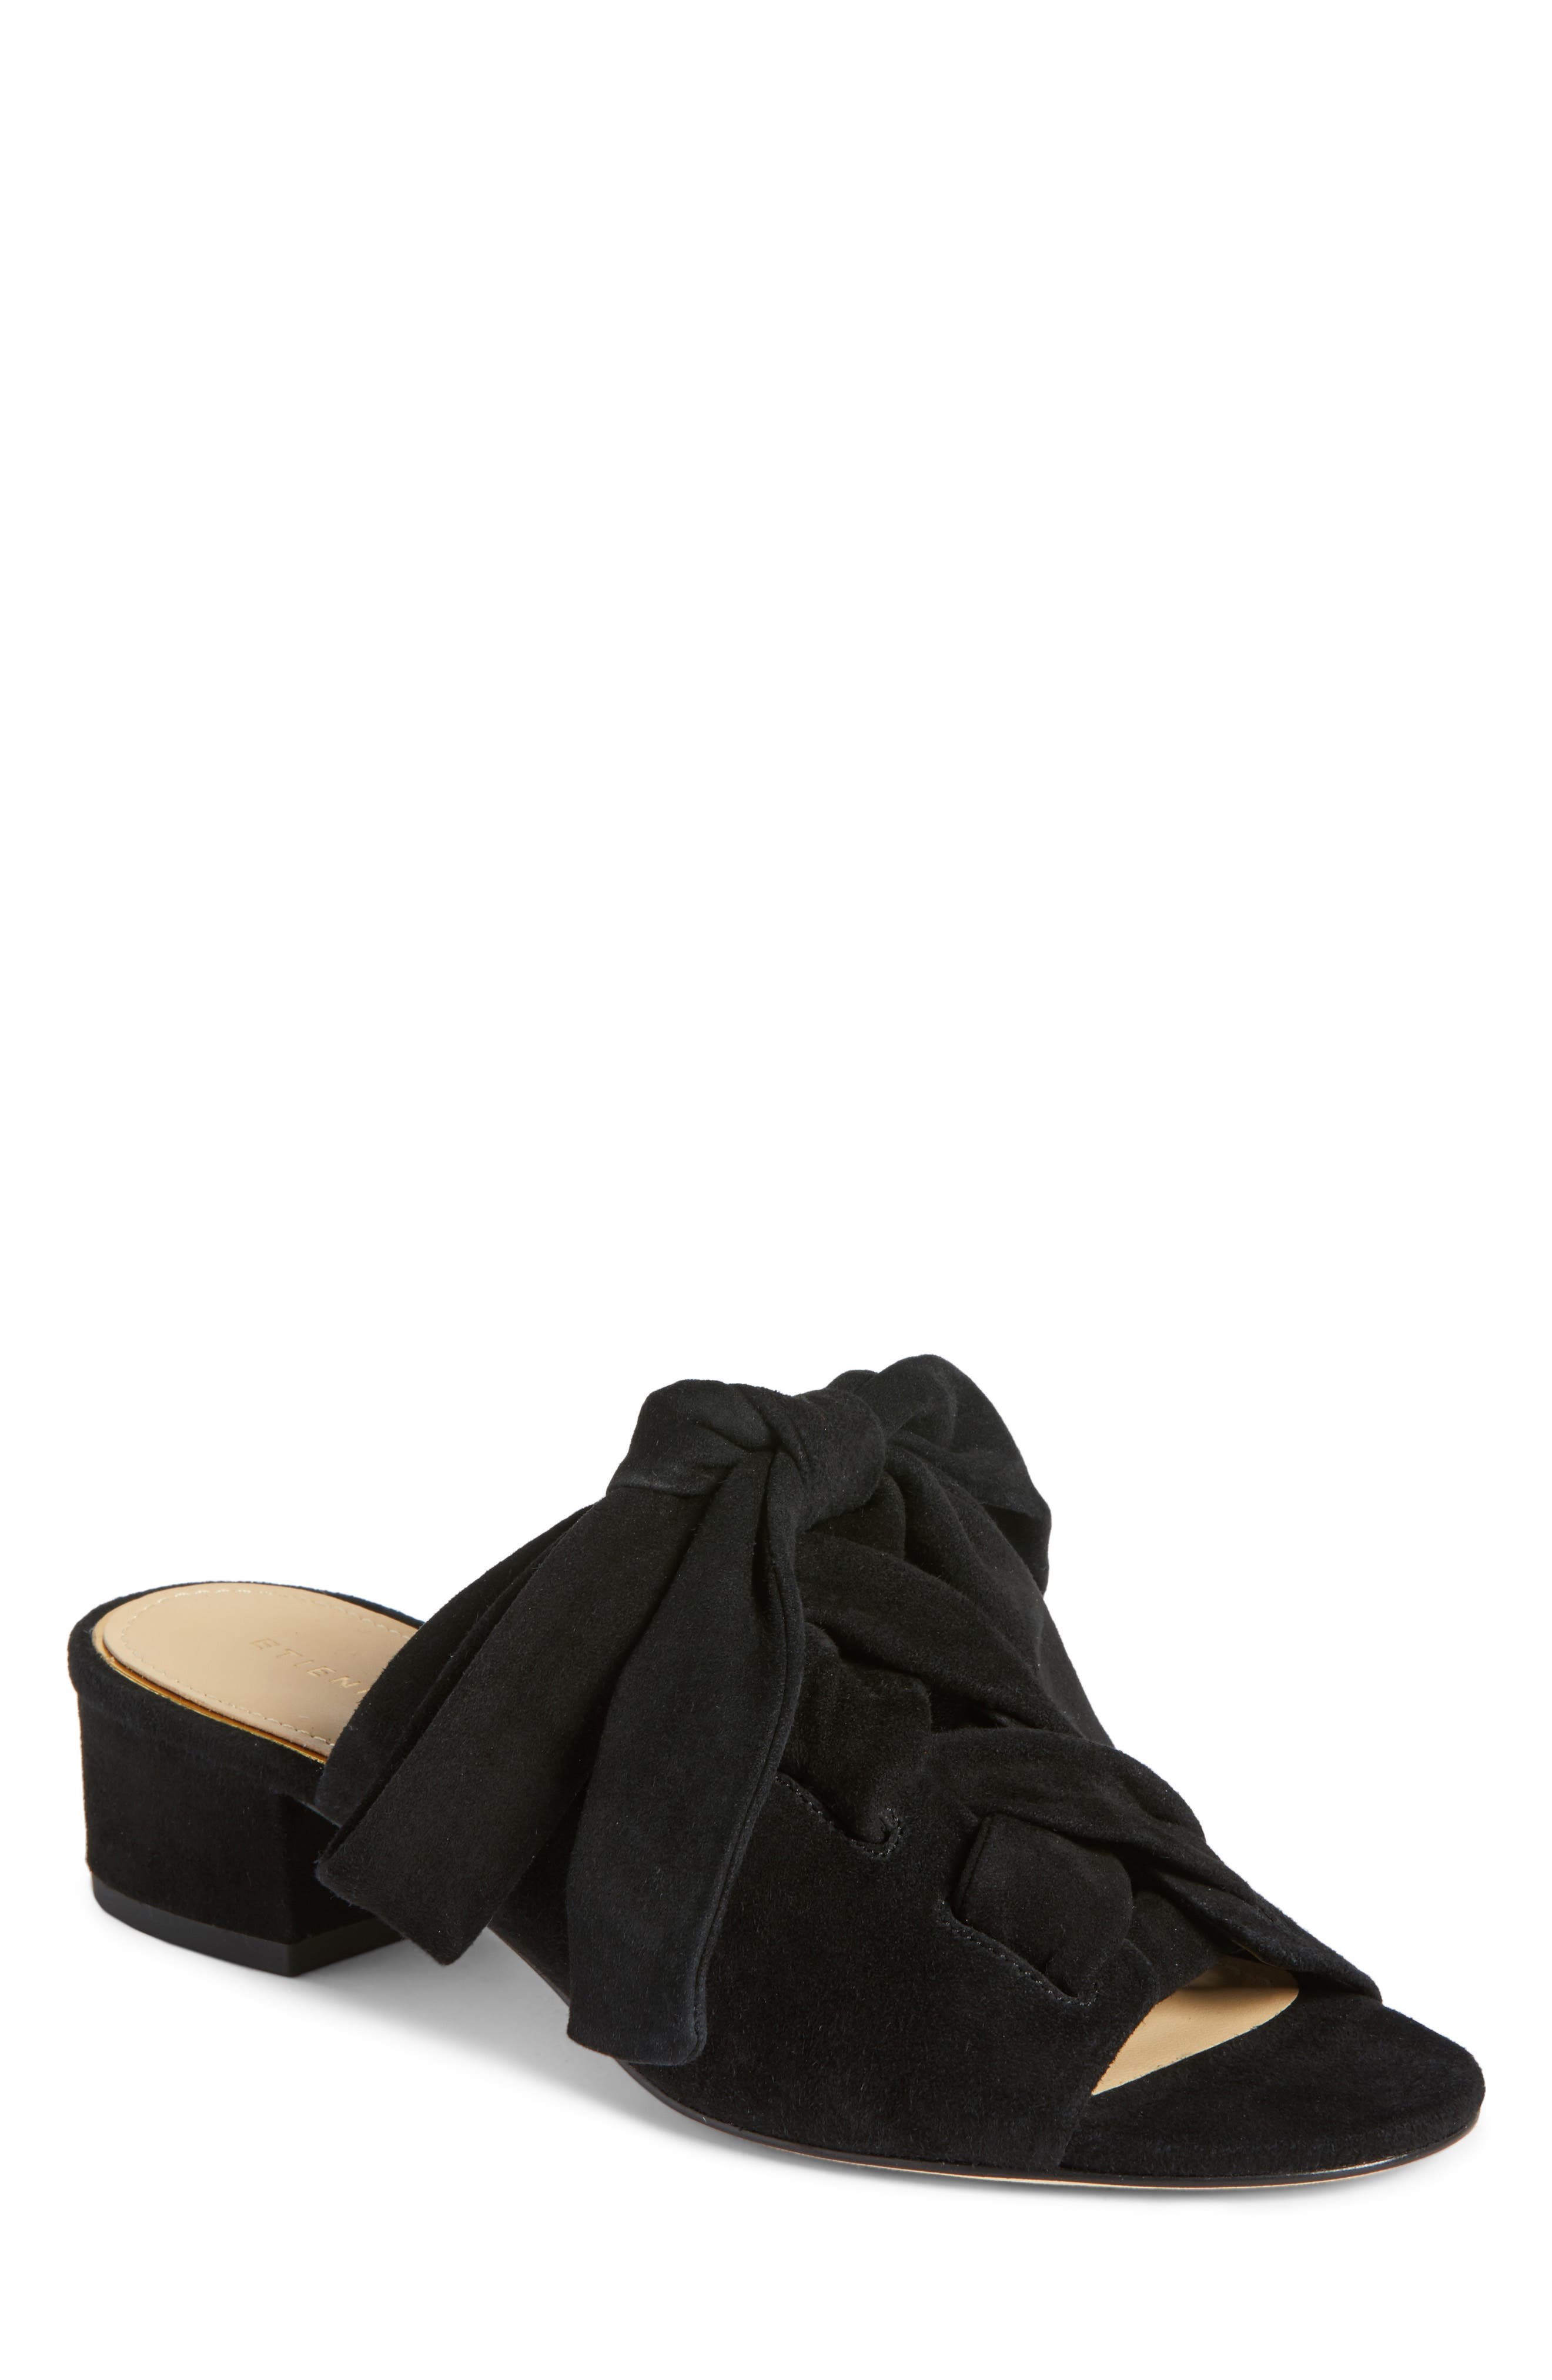 Bermuda Sandal,                         Main,                         color, BLACK SUEDE